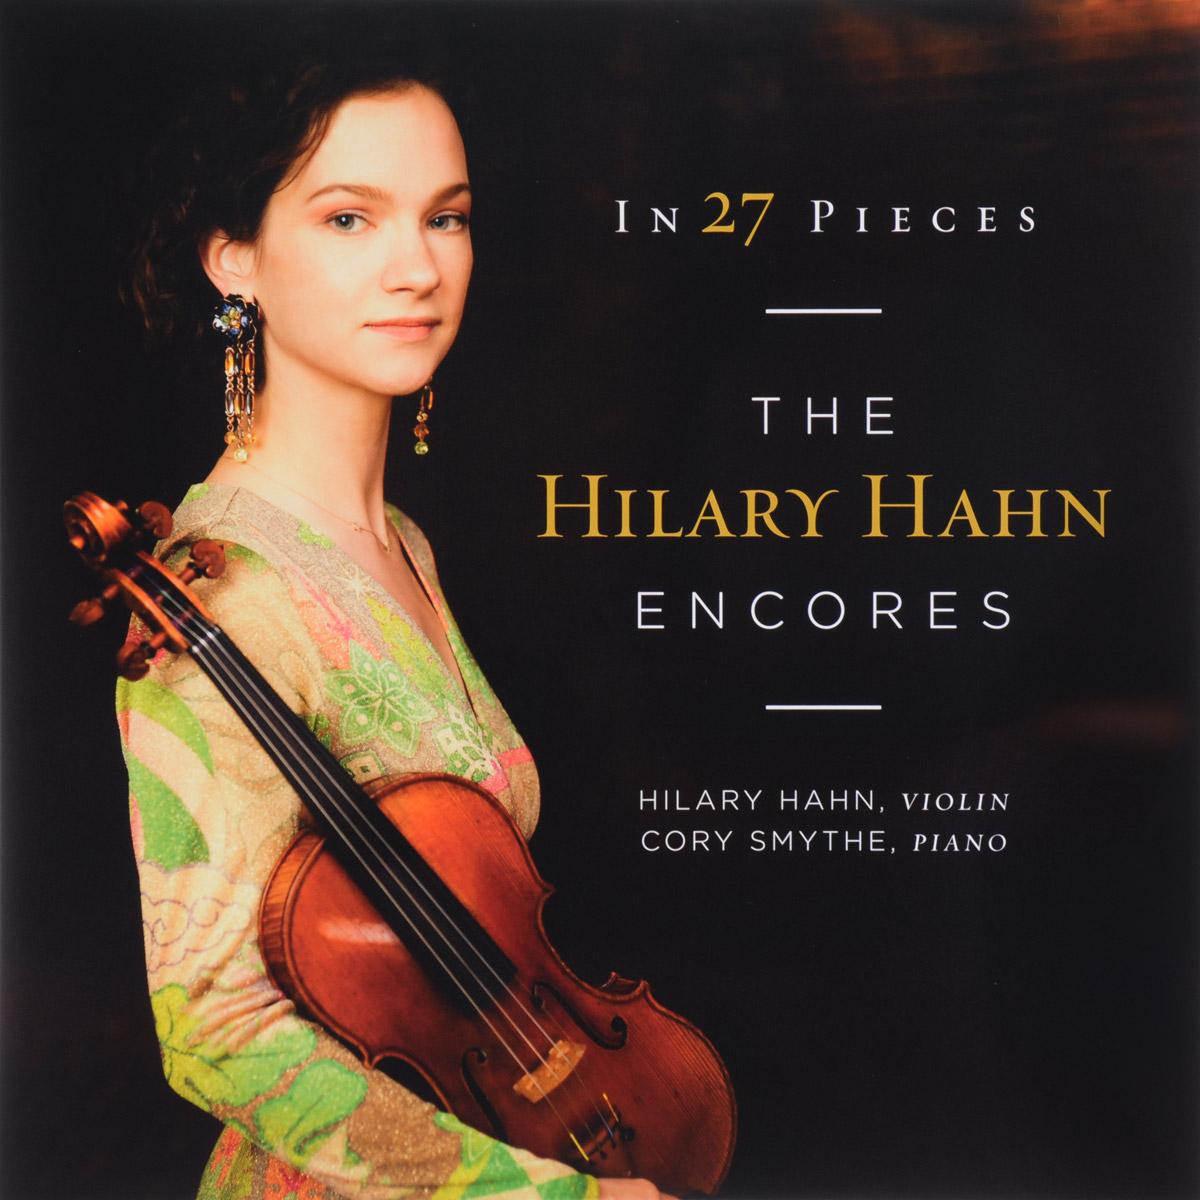 Хилари Хан Hilary Hahn. In 27 Pieces The Hilary Hahn Encores (2 LP) александр марков alexander markov dmitriy cogan famous violin encores